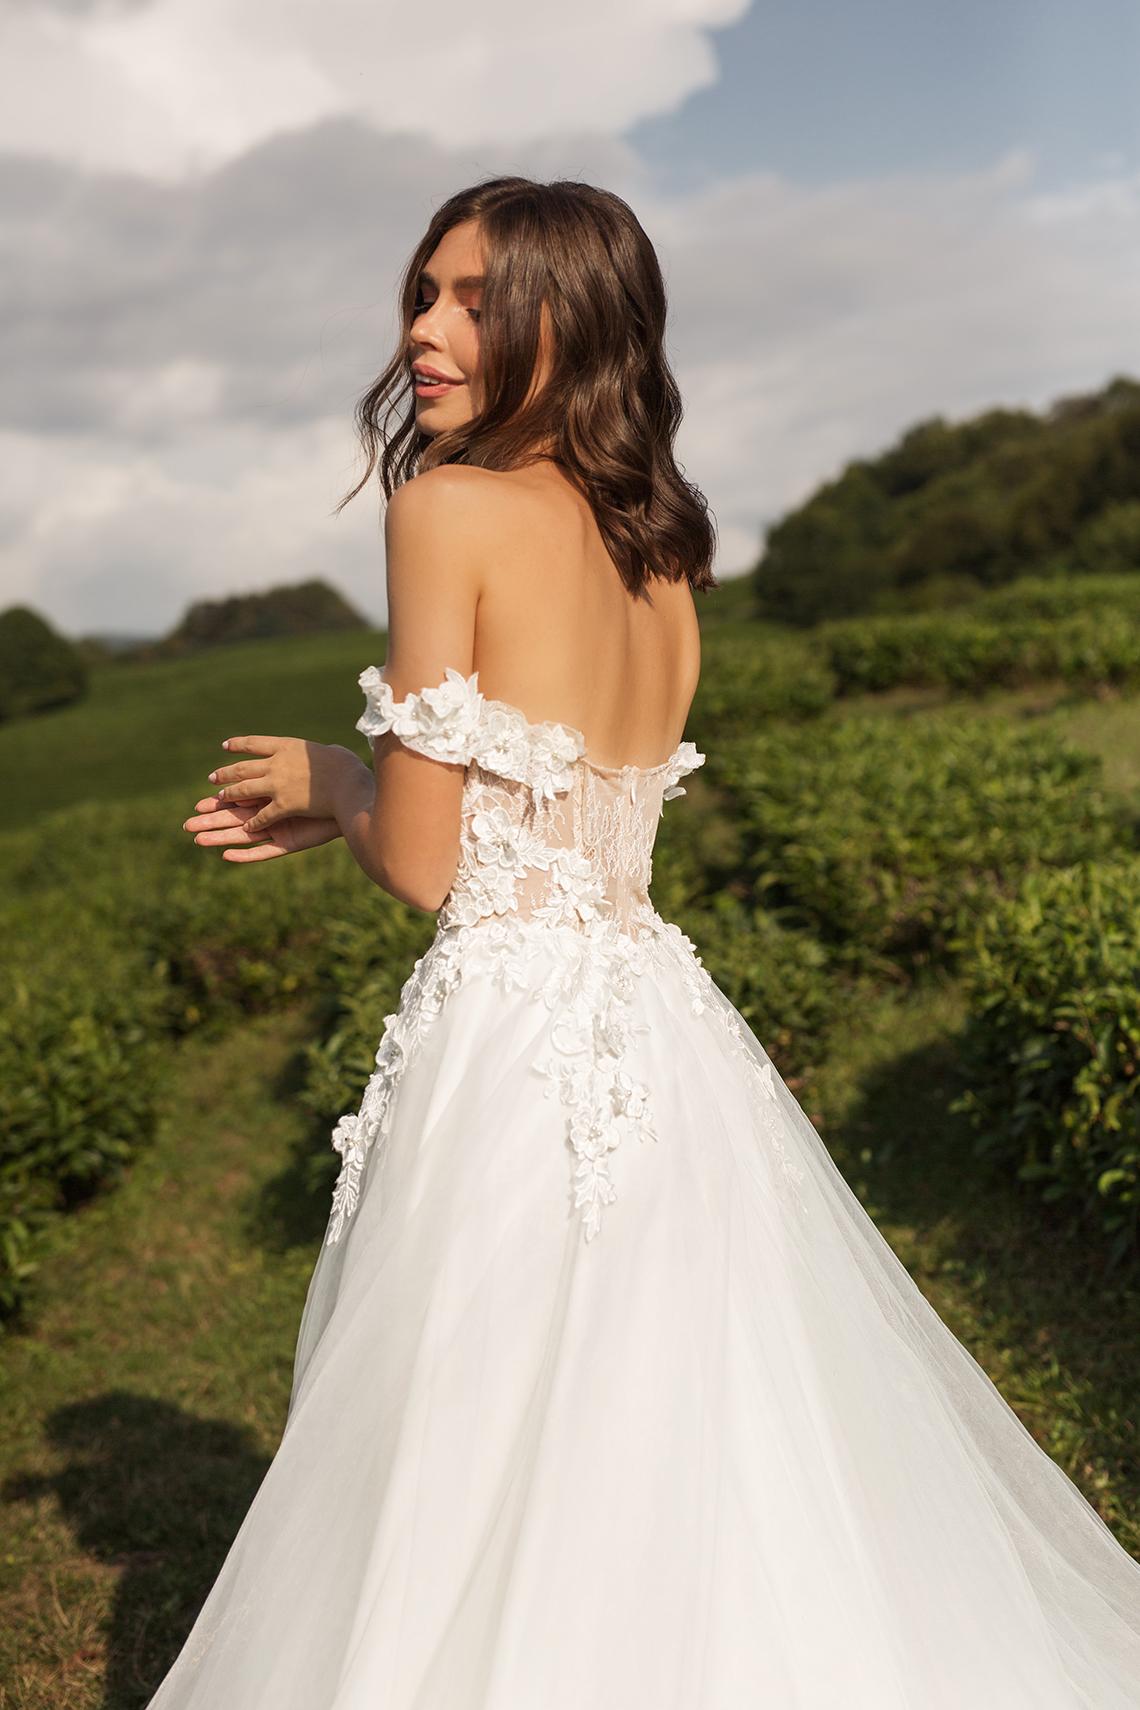 Feminine Simple Minimalistic Wedding Dresses by Mila Bridal 2020 2021 – Bridal Musings 1